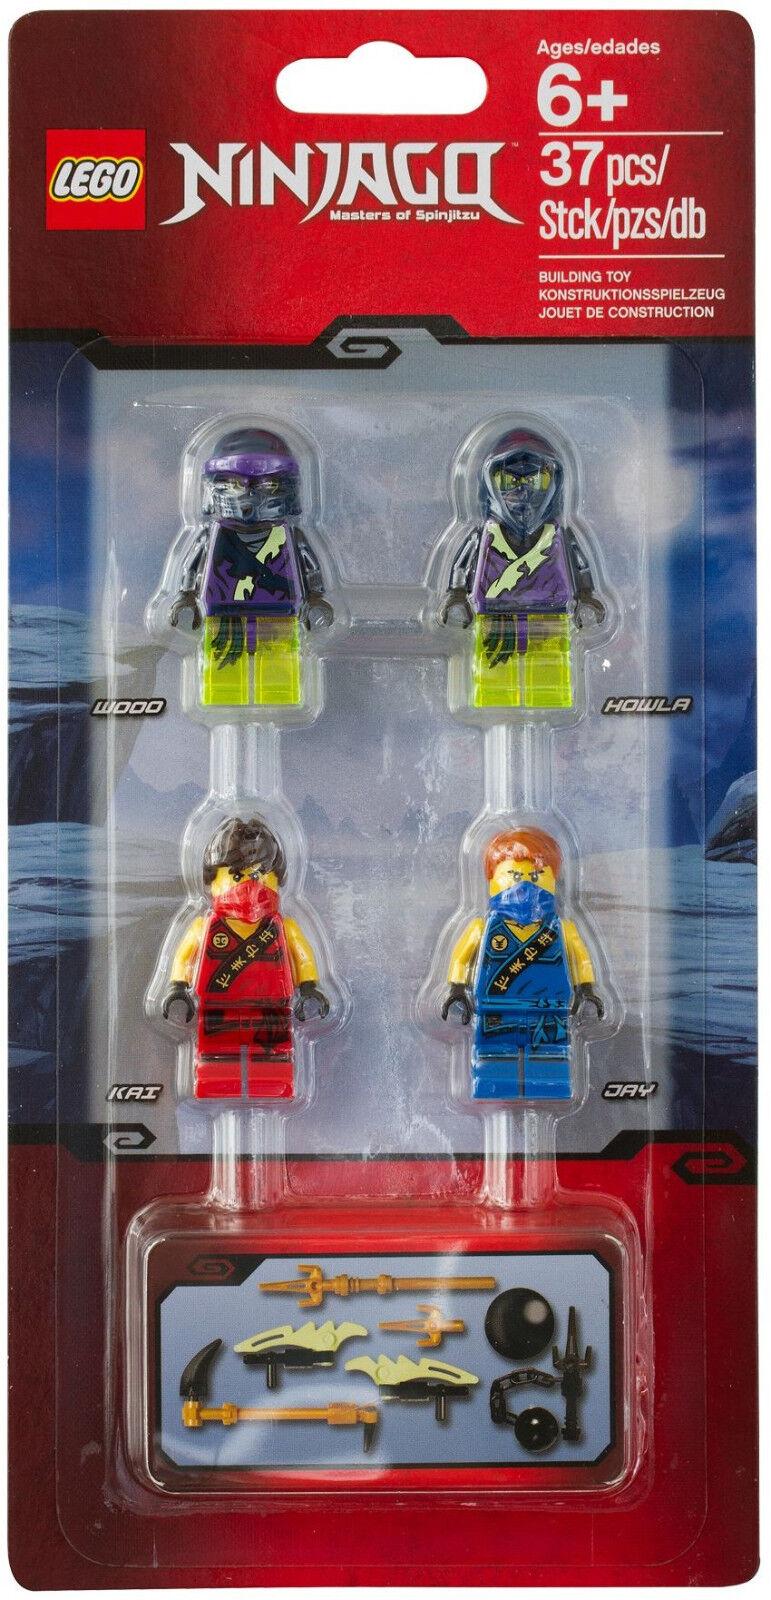 LEGO Ninjago - 851342 851342 851342 Ninja Army Building Set mit Kai, Wooo und Howla Neu & OVP e80c29